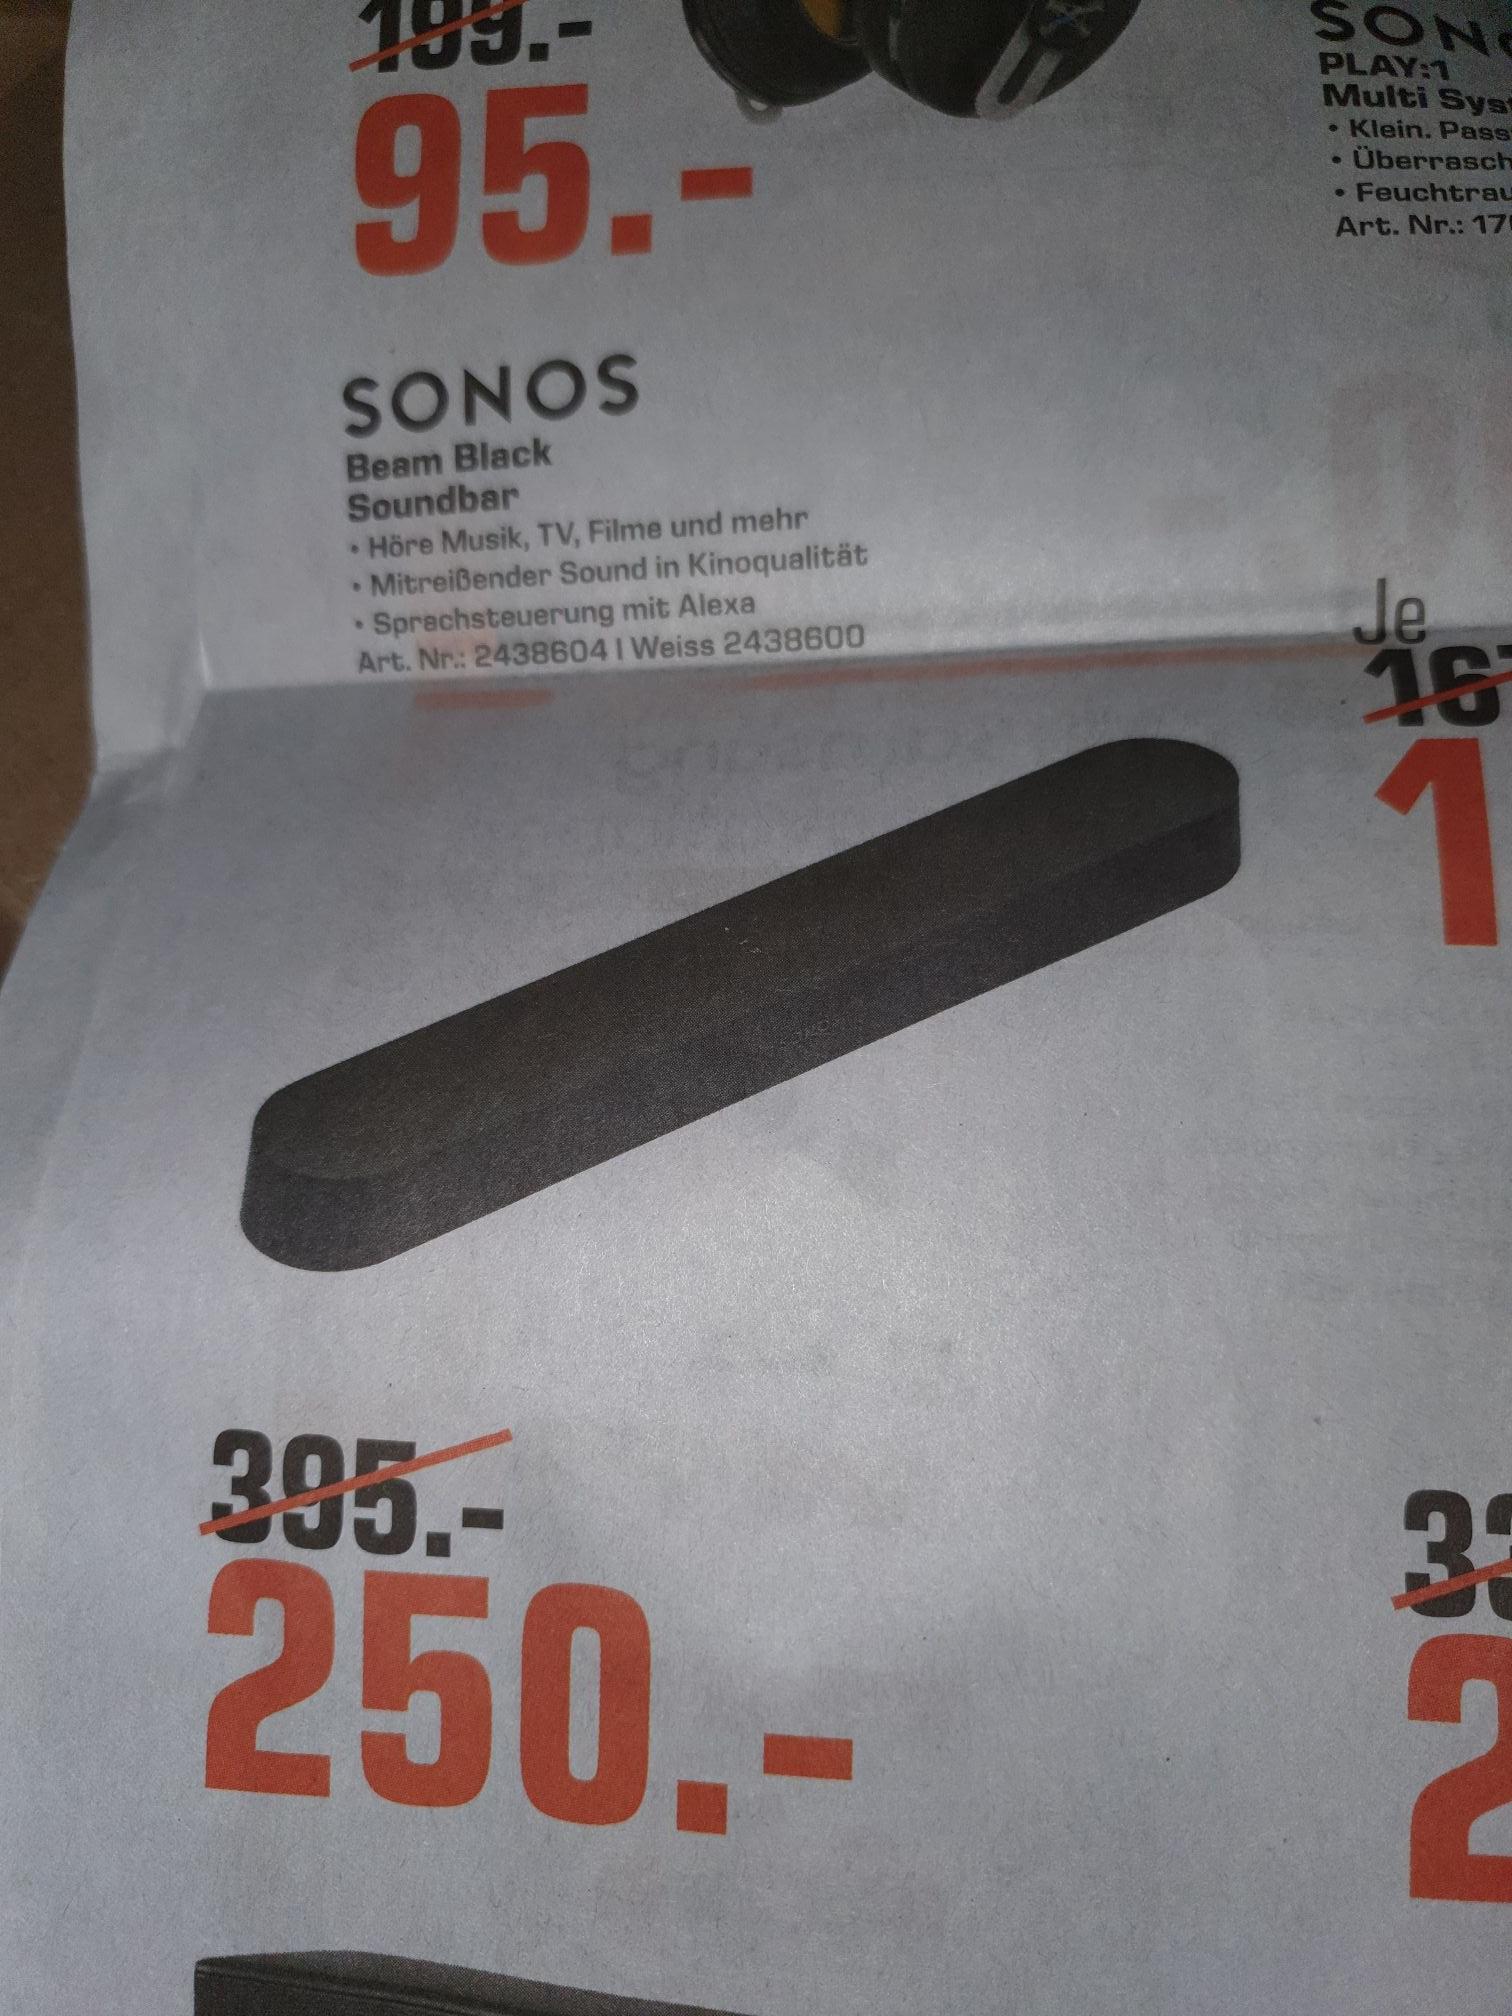 lokal saturn magdeburg sonos beam schwarz f r 250 sonos play 1 120 sonos one gen2 wei 180. Black Bedroom Furniture Sets. Home Design Ideas